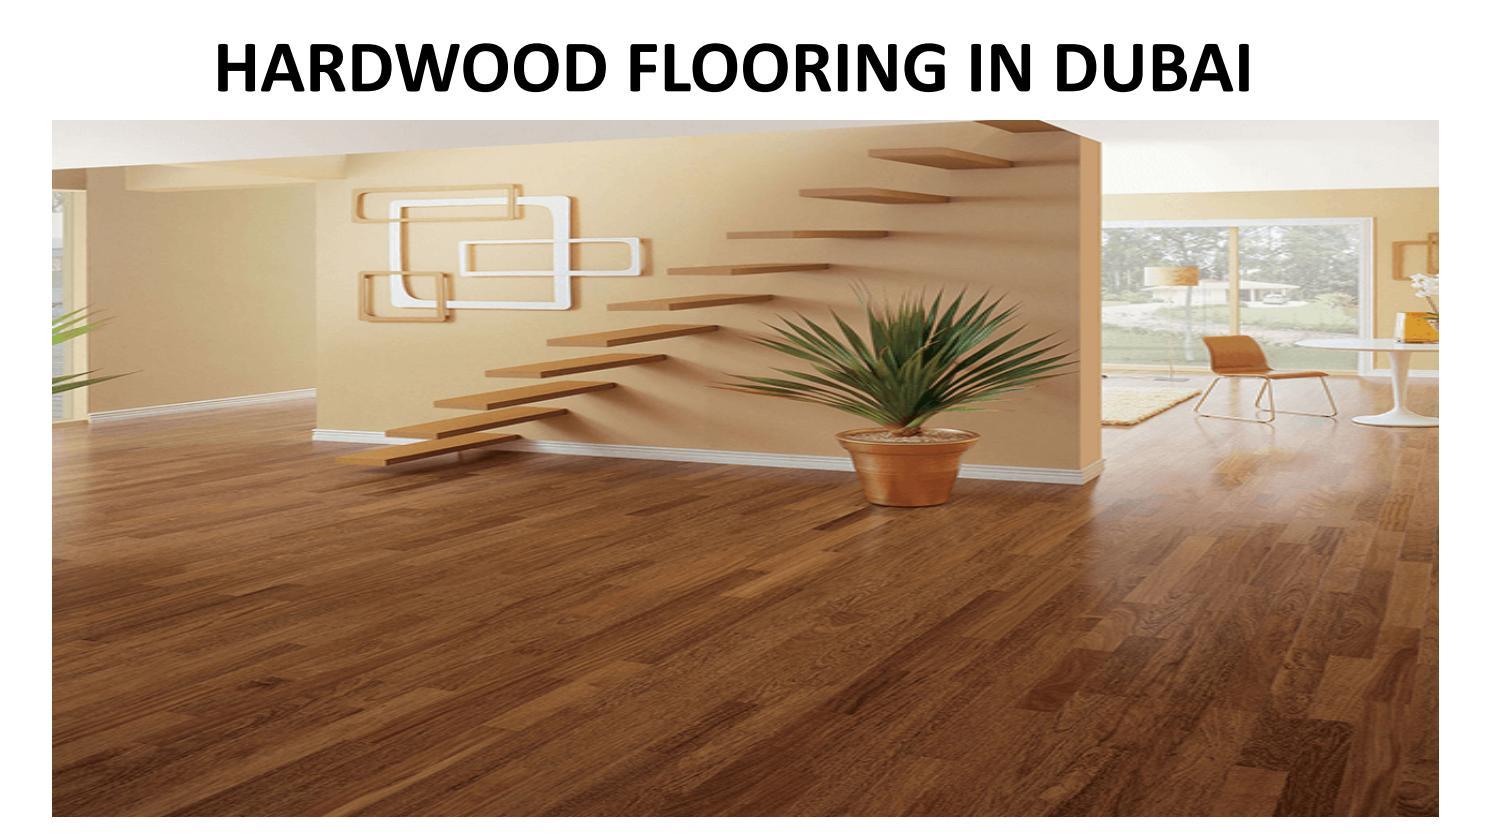 Hardwood Flooring In Dubai By Mickey Micheal Issuu